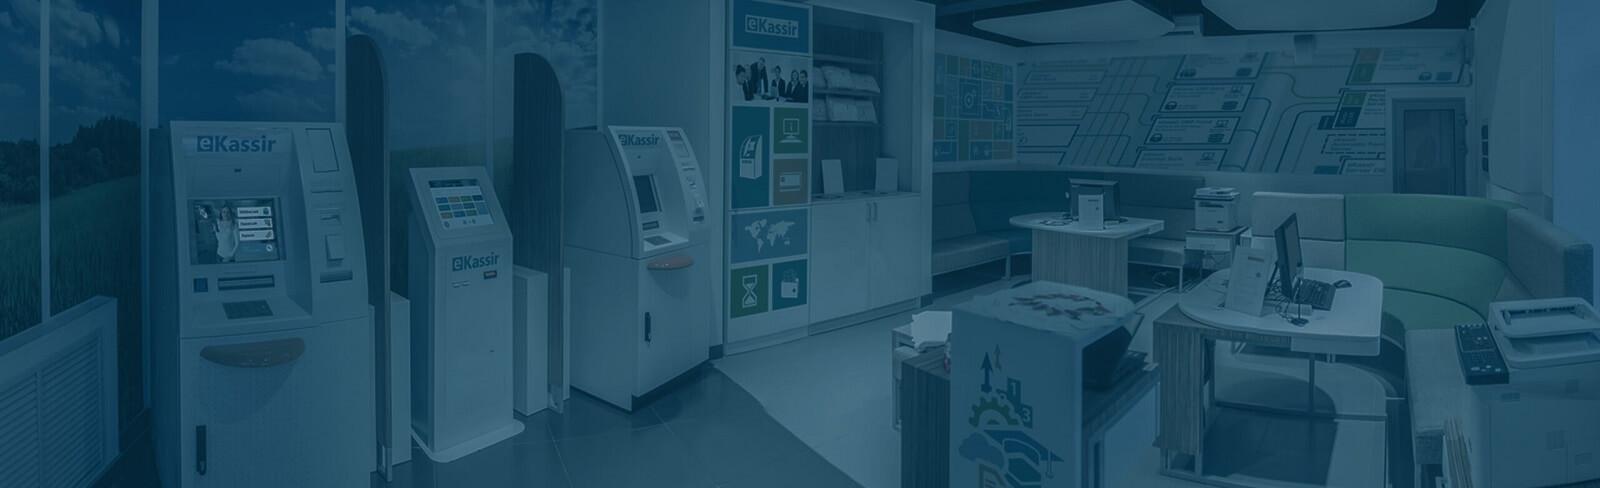 Teller Desk & Unified Front App